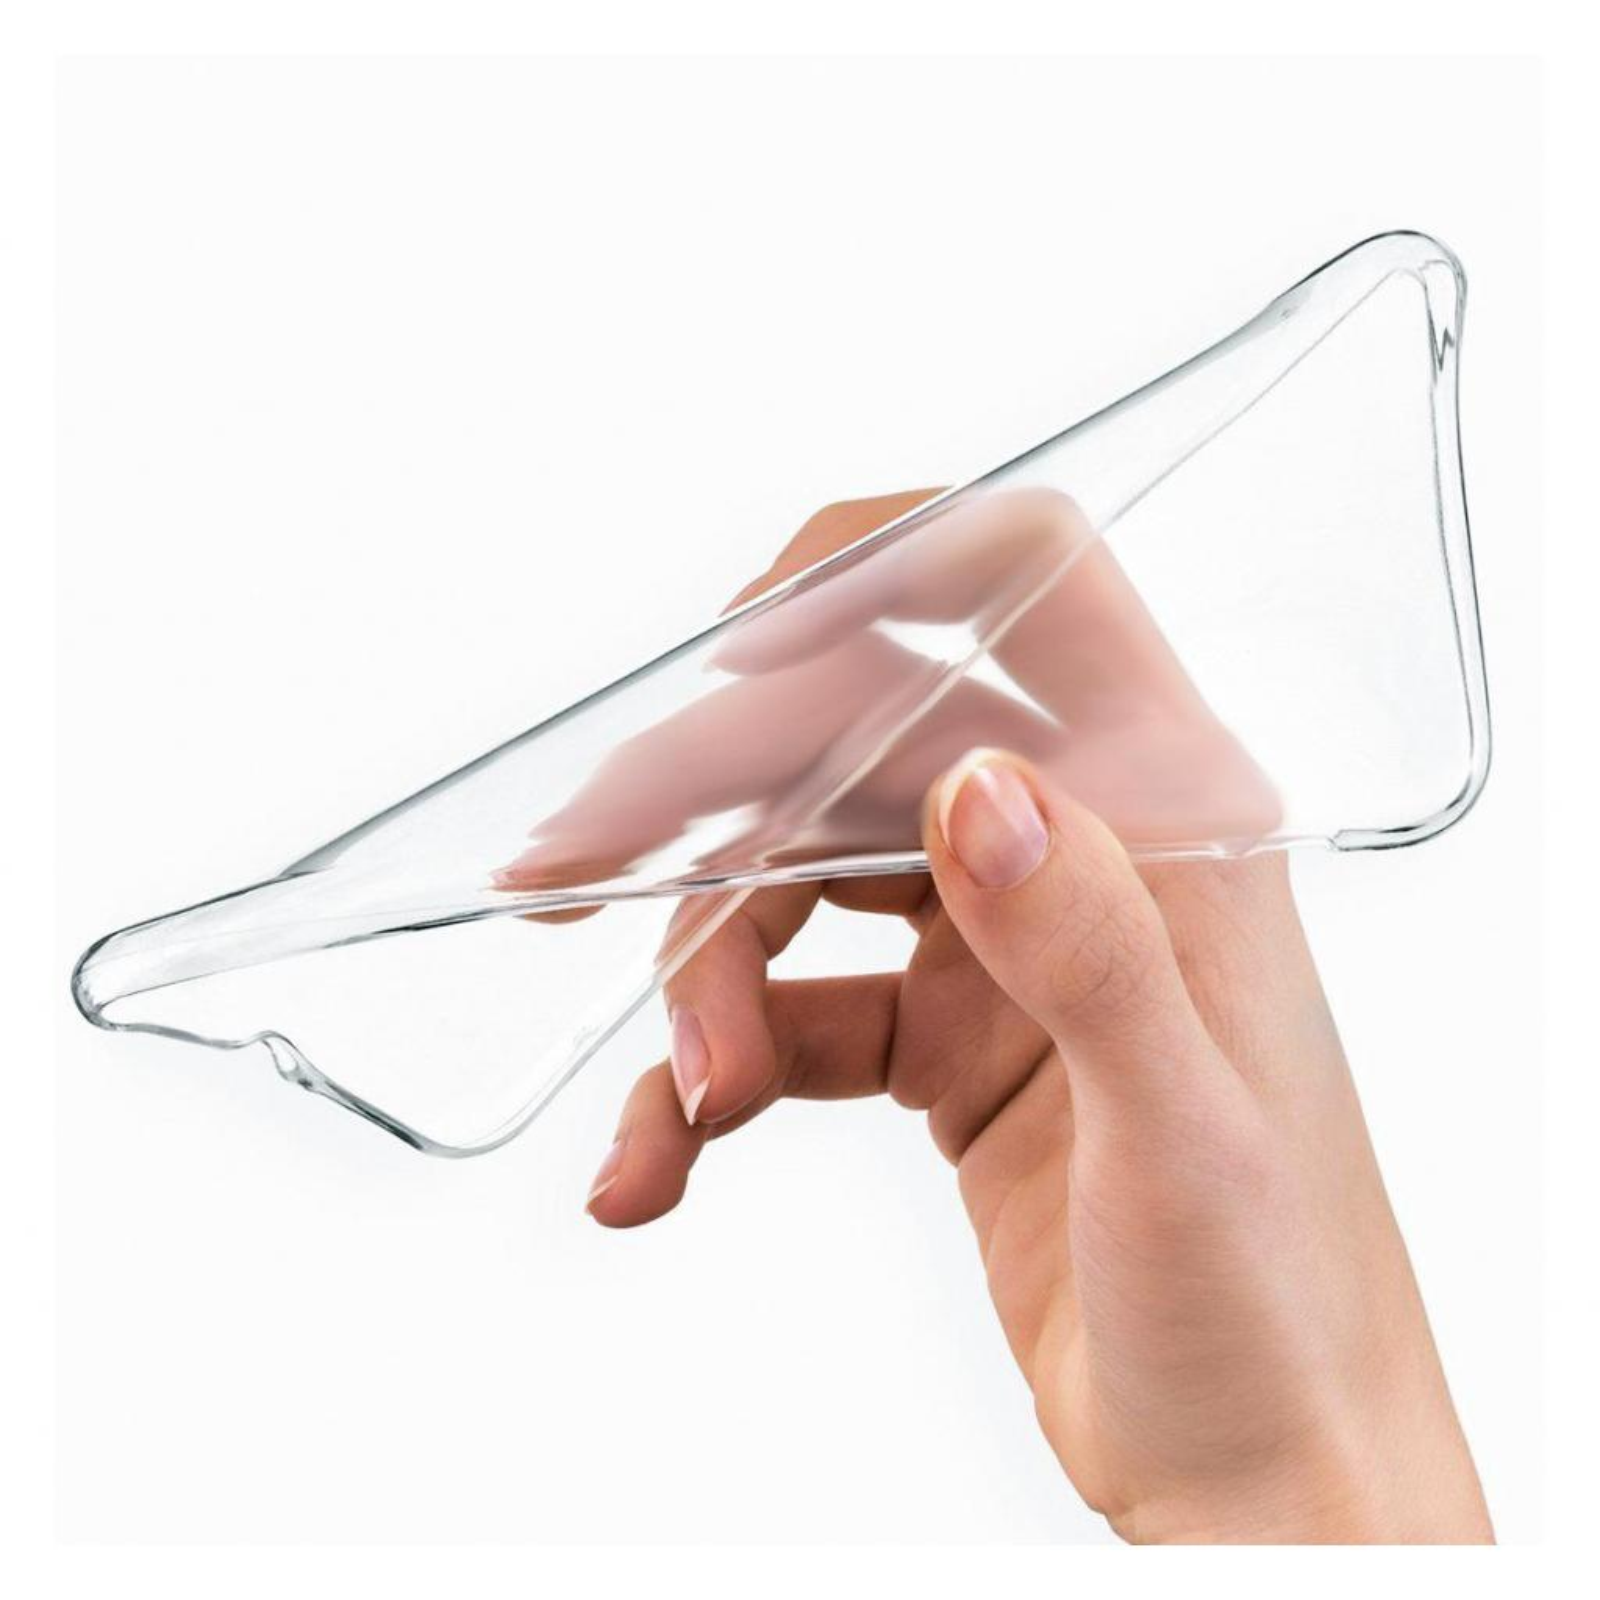 Чехол для моб. телефона SmartCase Samsung Galaxy A7 /A720 TPU Clear (SC-A7) изображение 6